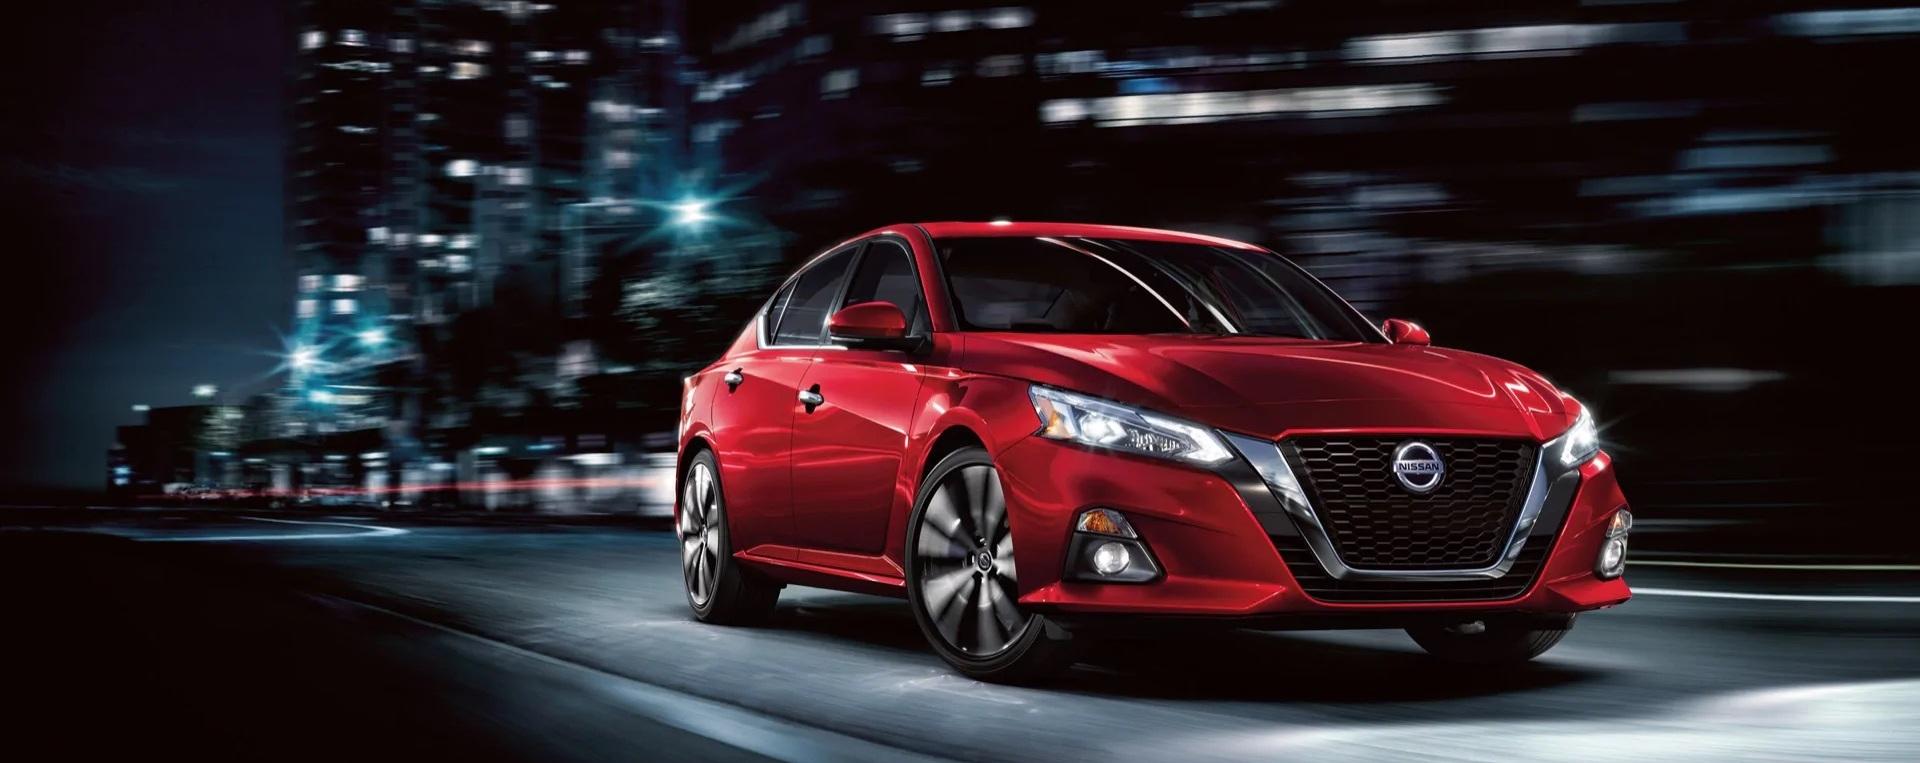 2020 Nissan Altima for Sale near Sparks, NV